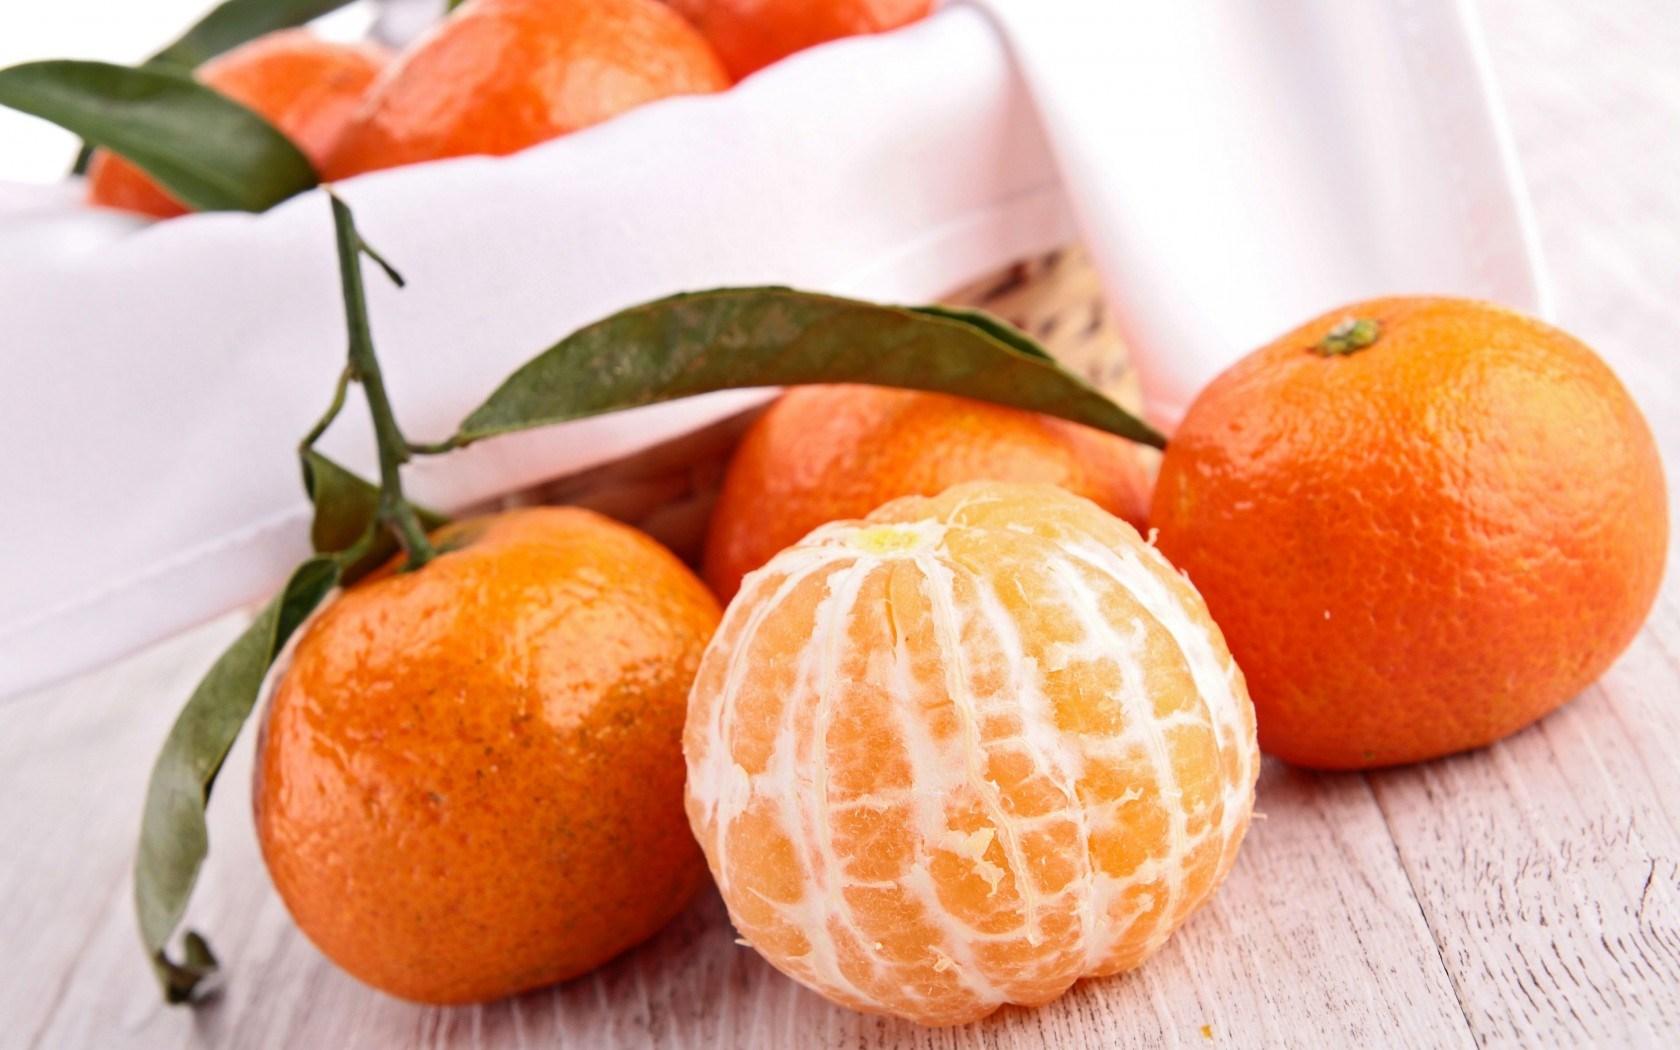 tangerine-wallpapers-37523-38385-hd-wallpapers